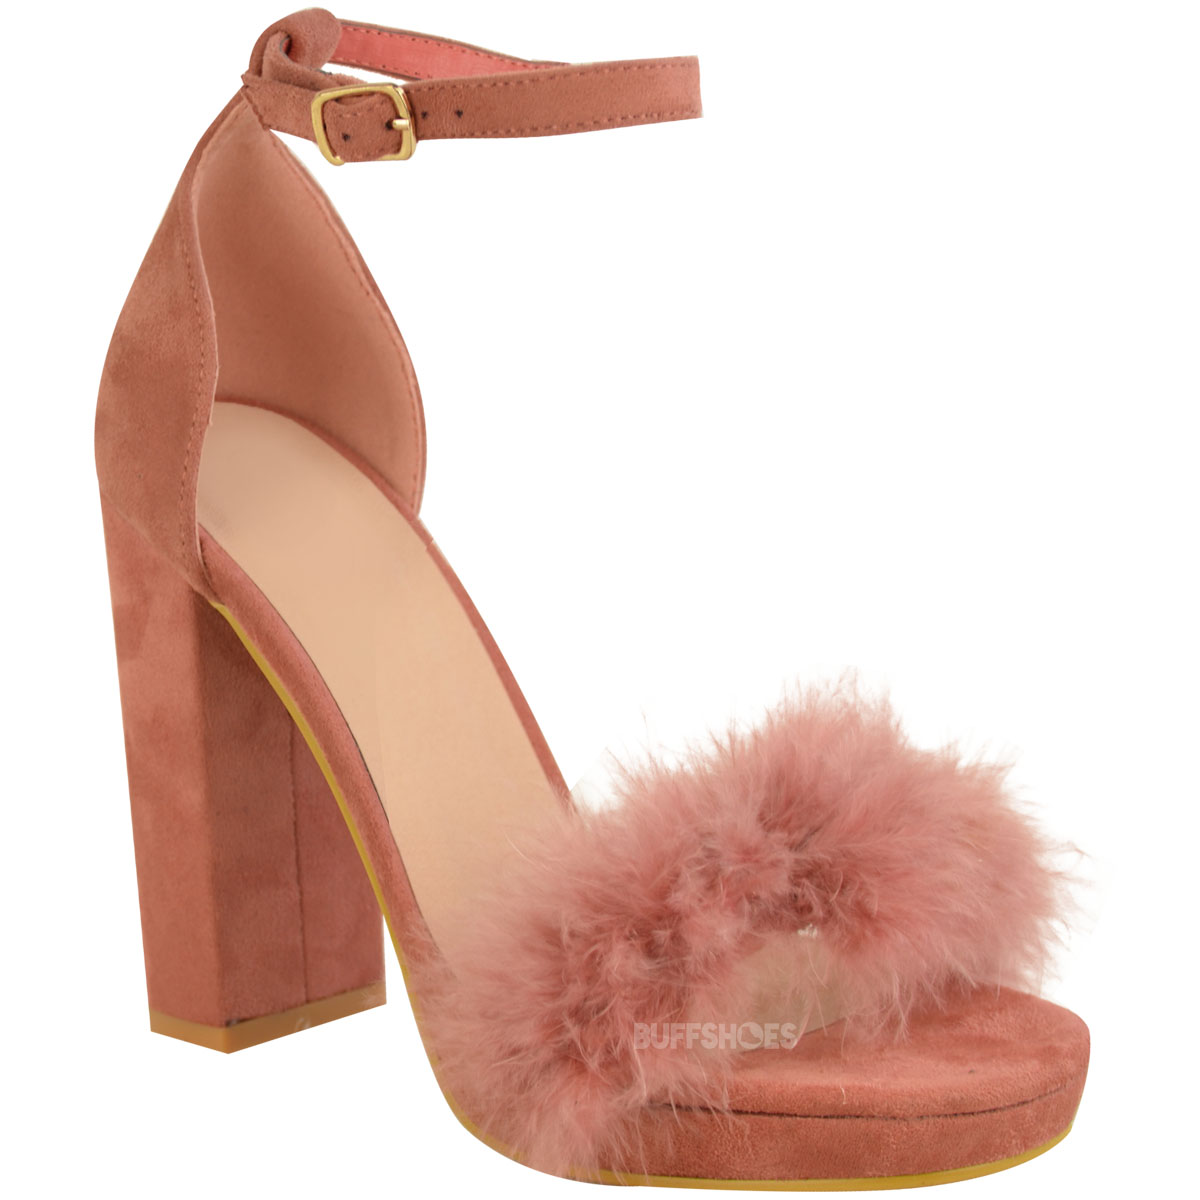 b709b625bc4 Womens Ladies Faux Fur Fluffy Marabou Sandals High Block Heel ...